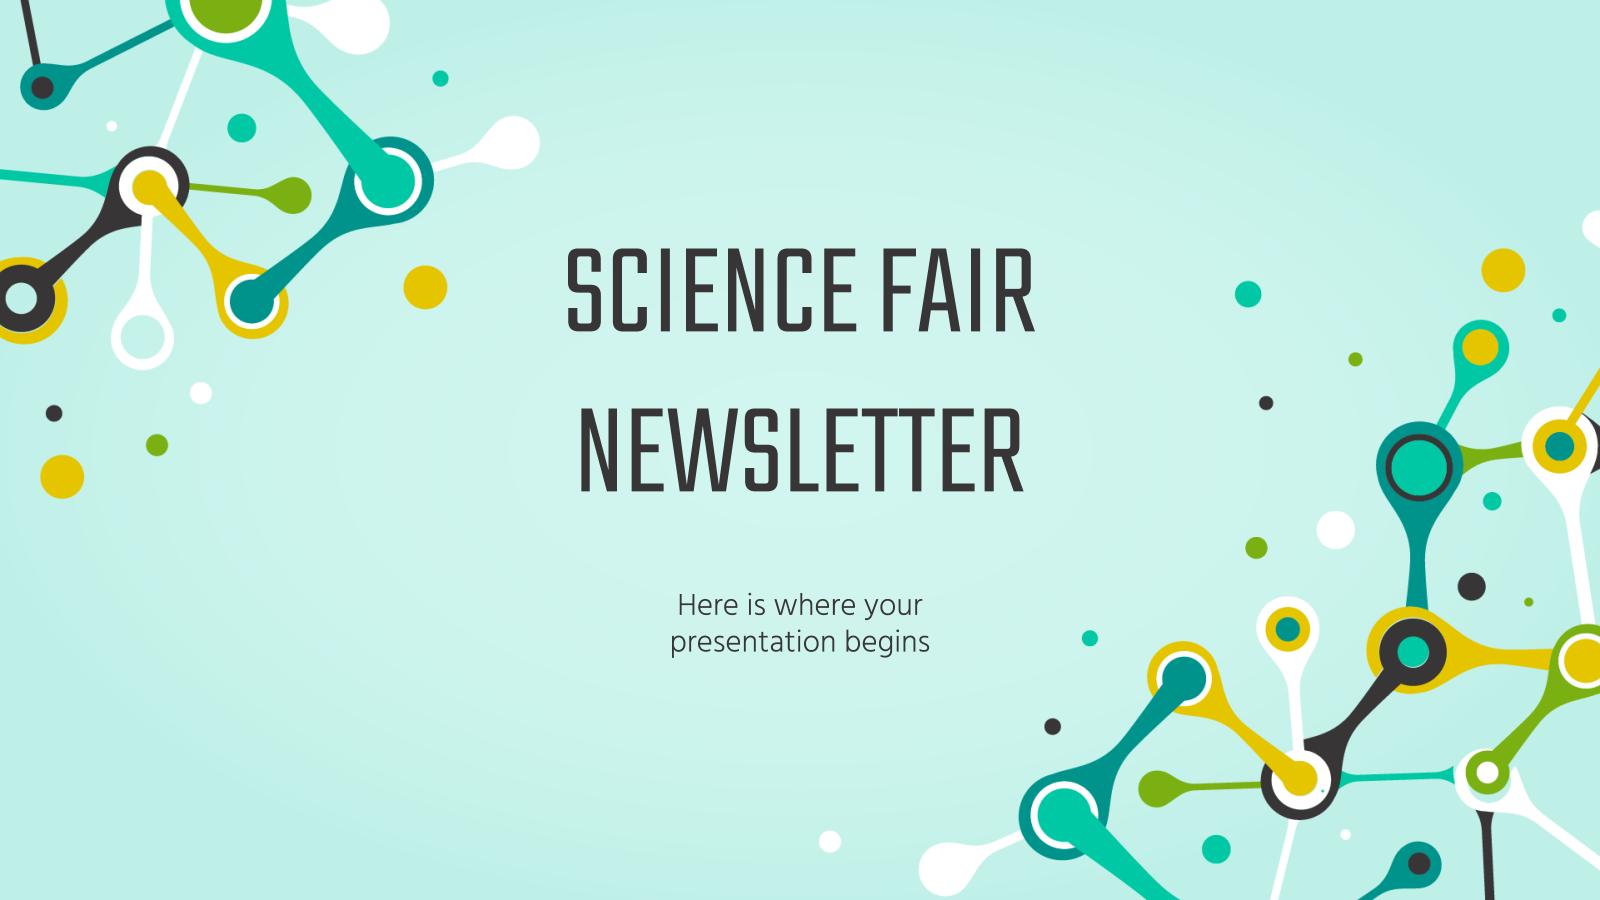 Science Fair Newsletter presentation template